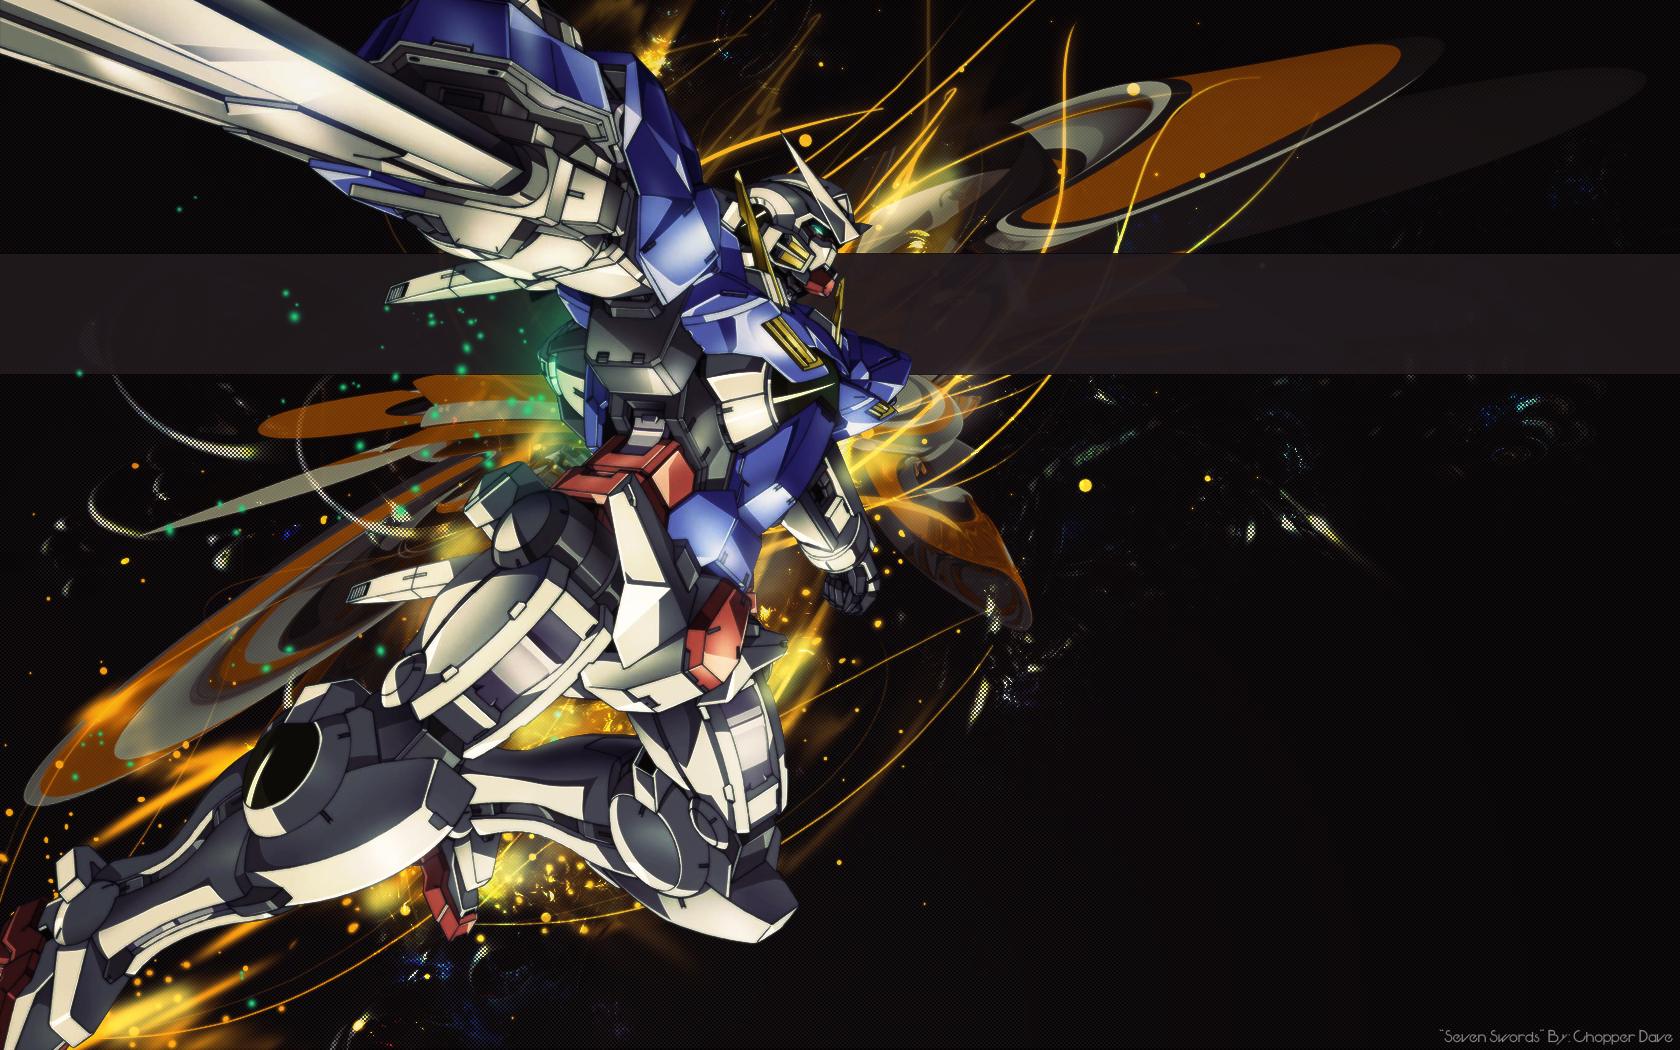 Gundam Wallpaper 12 Cool Wallpaper   Animewpcom 1680x1050